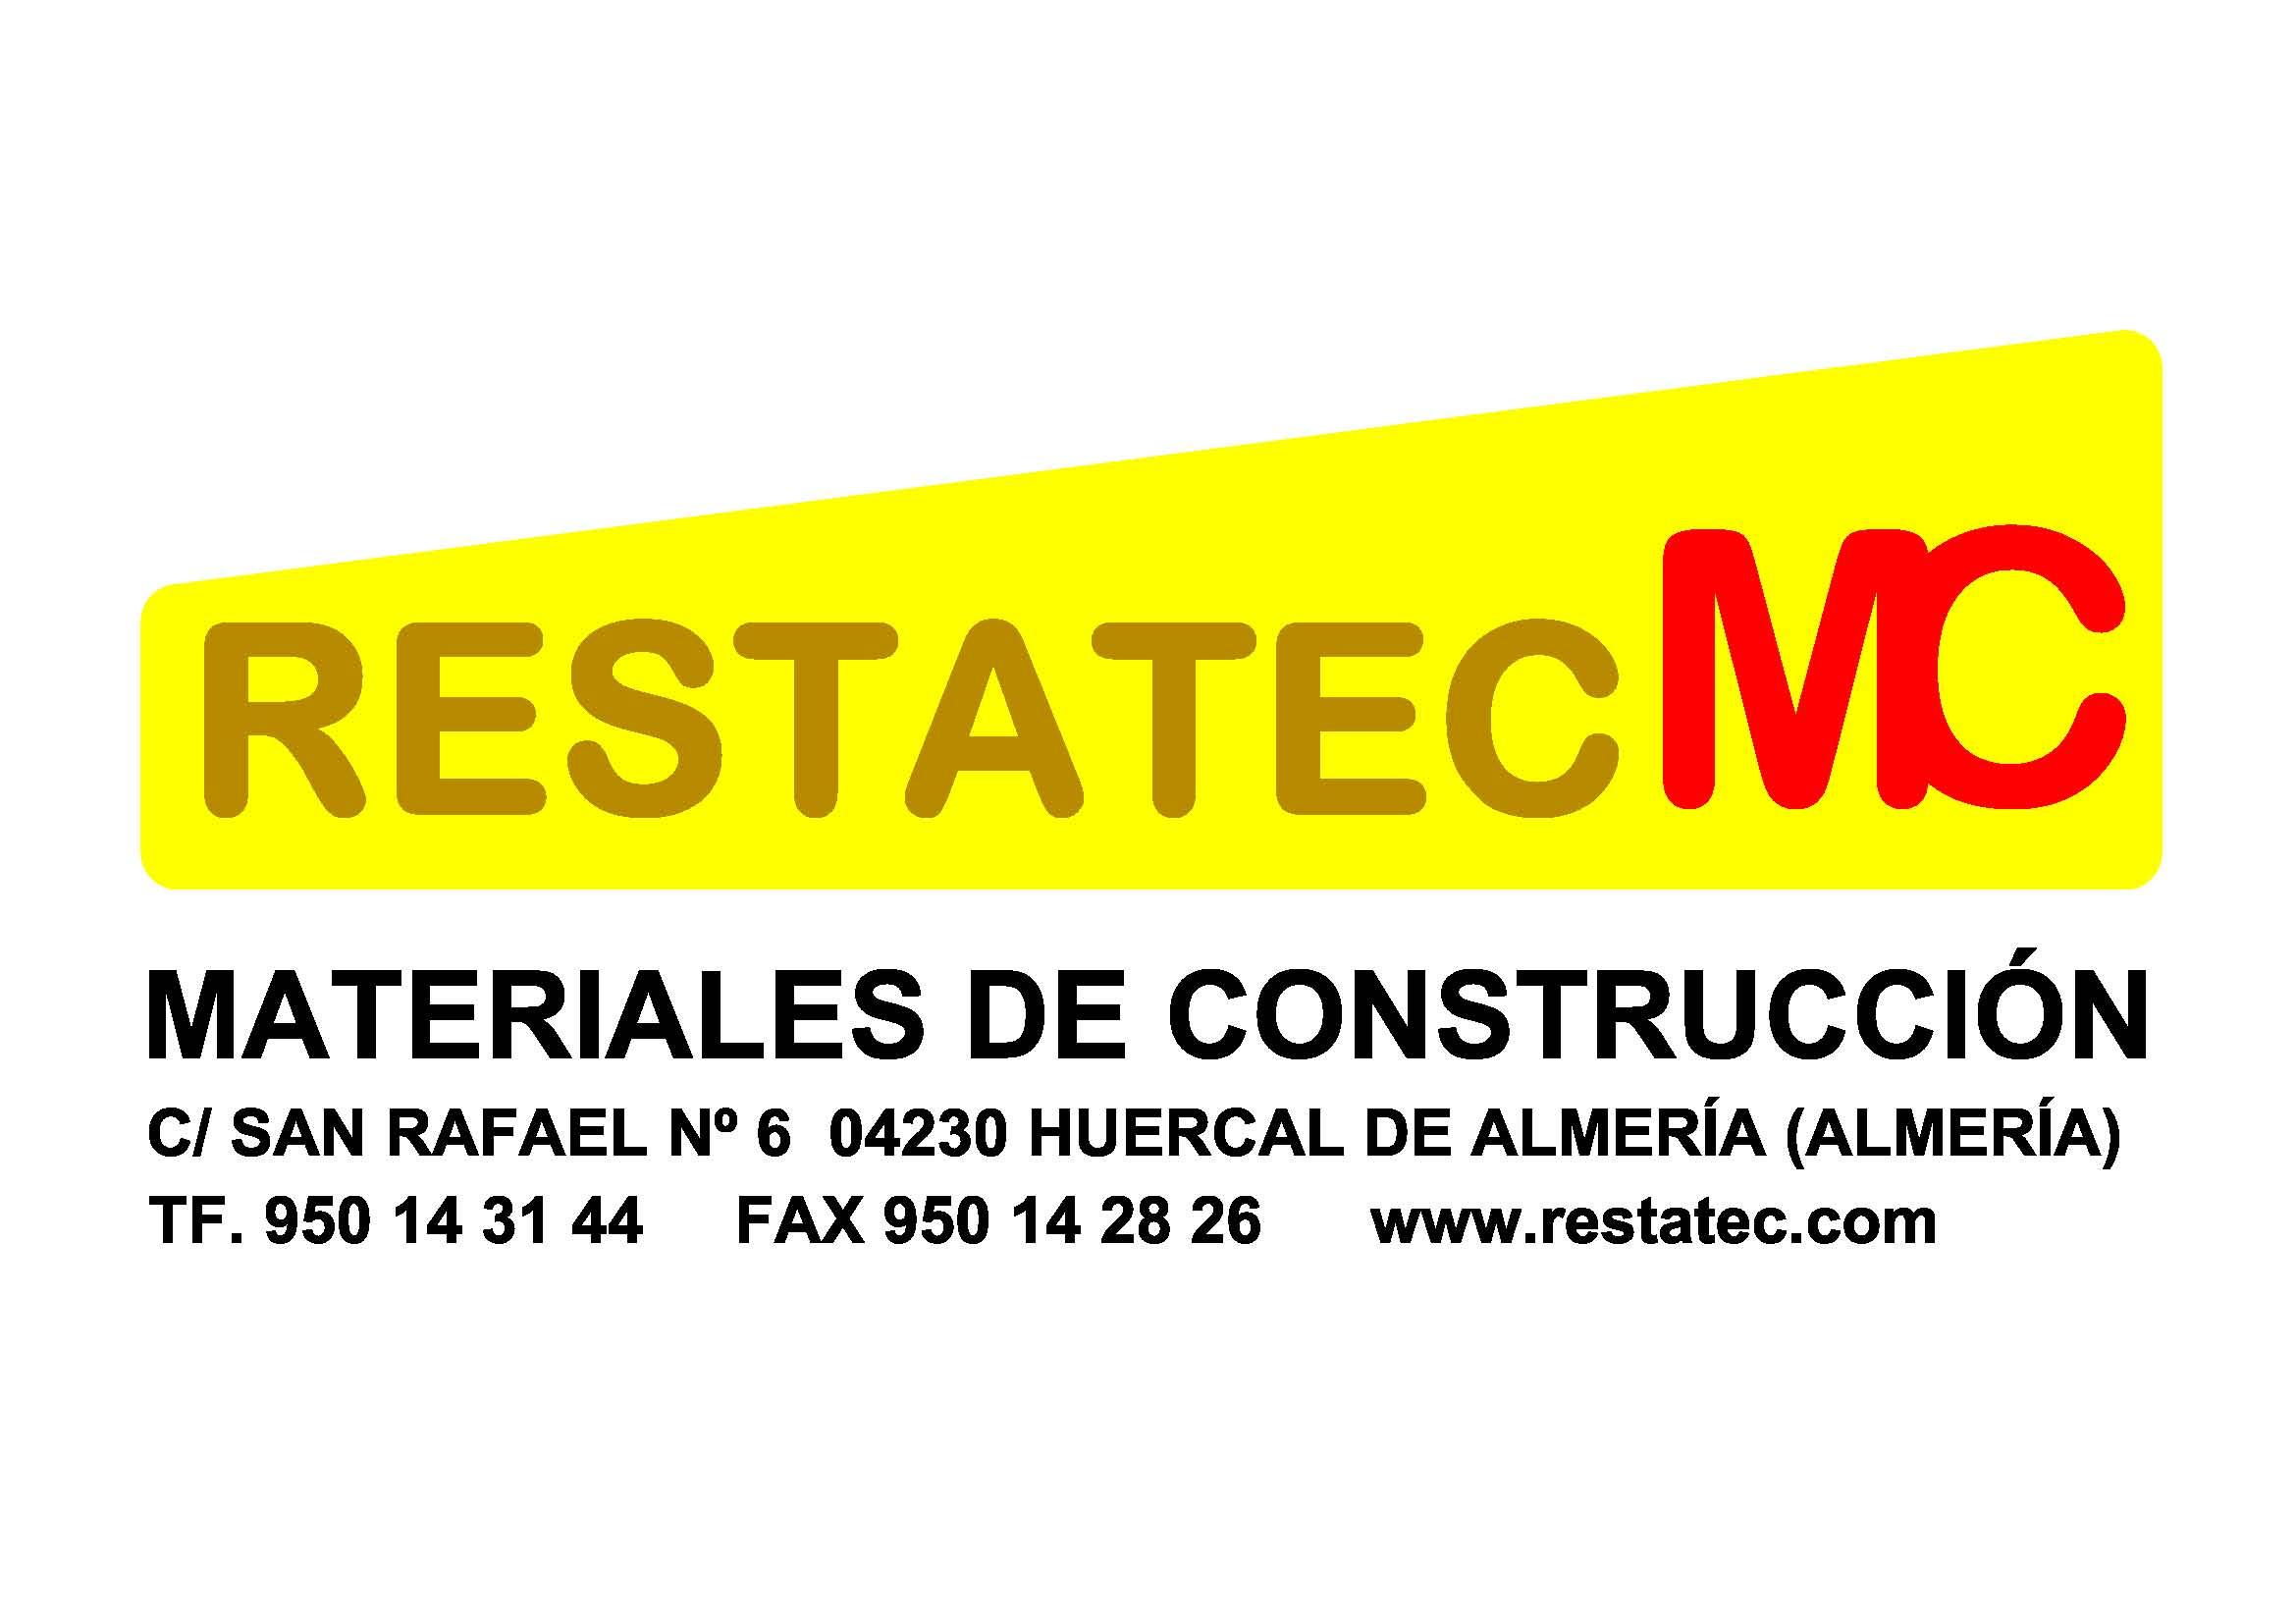 Restatec materiales de construcci n - Materiales de construccion on line ...